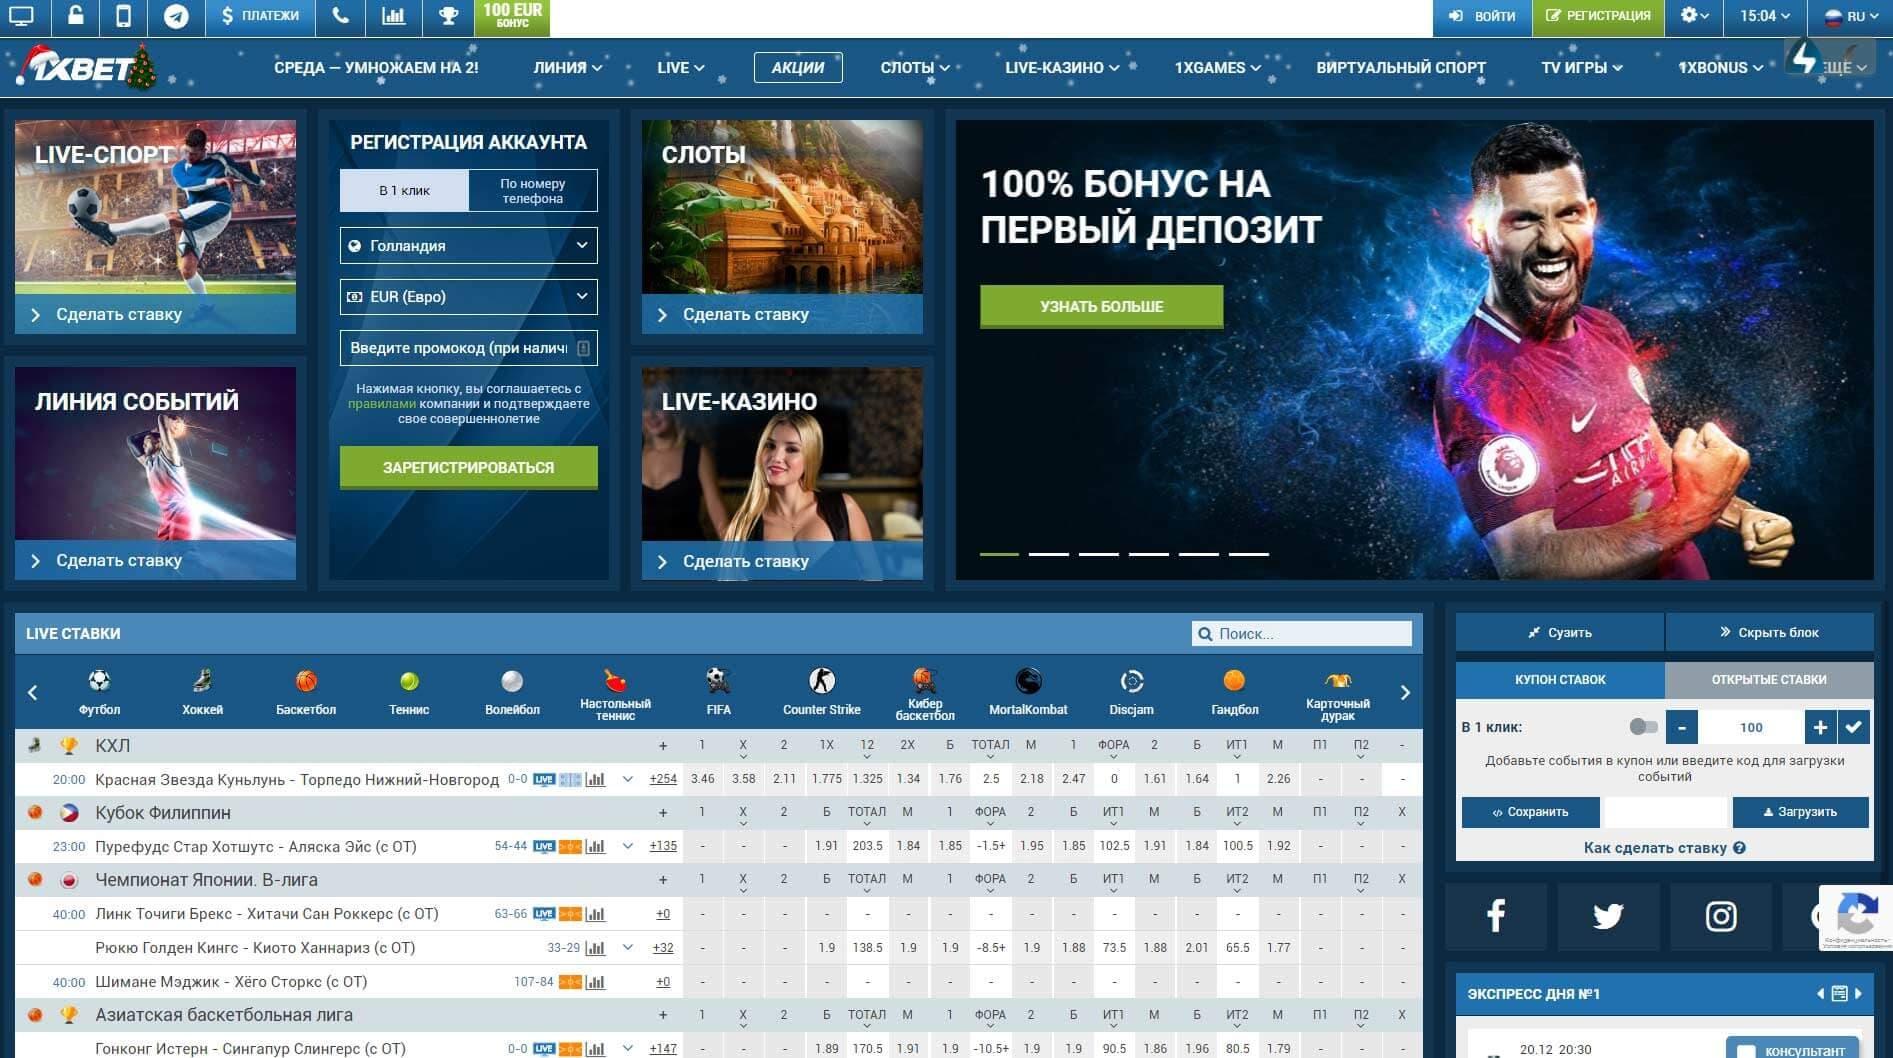 казино онлайн 1хбет новое зеркало